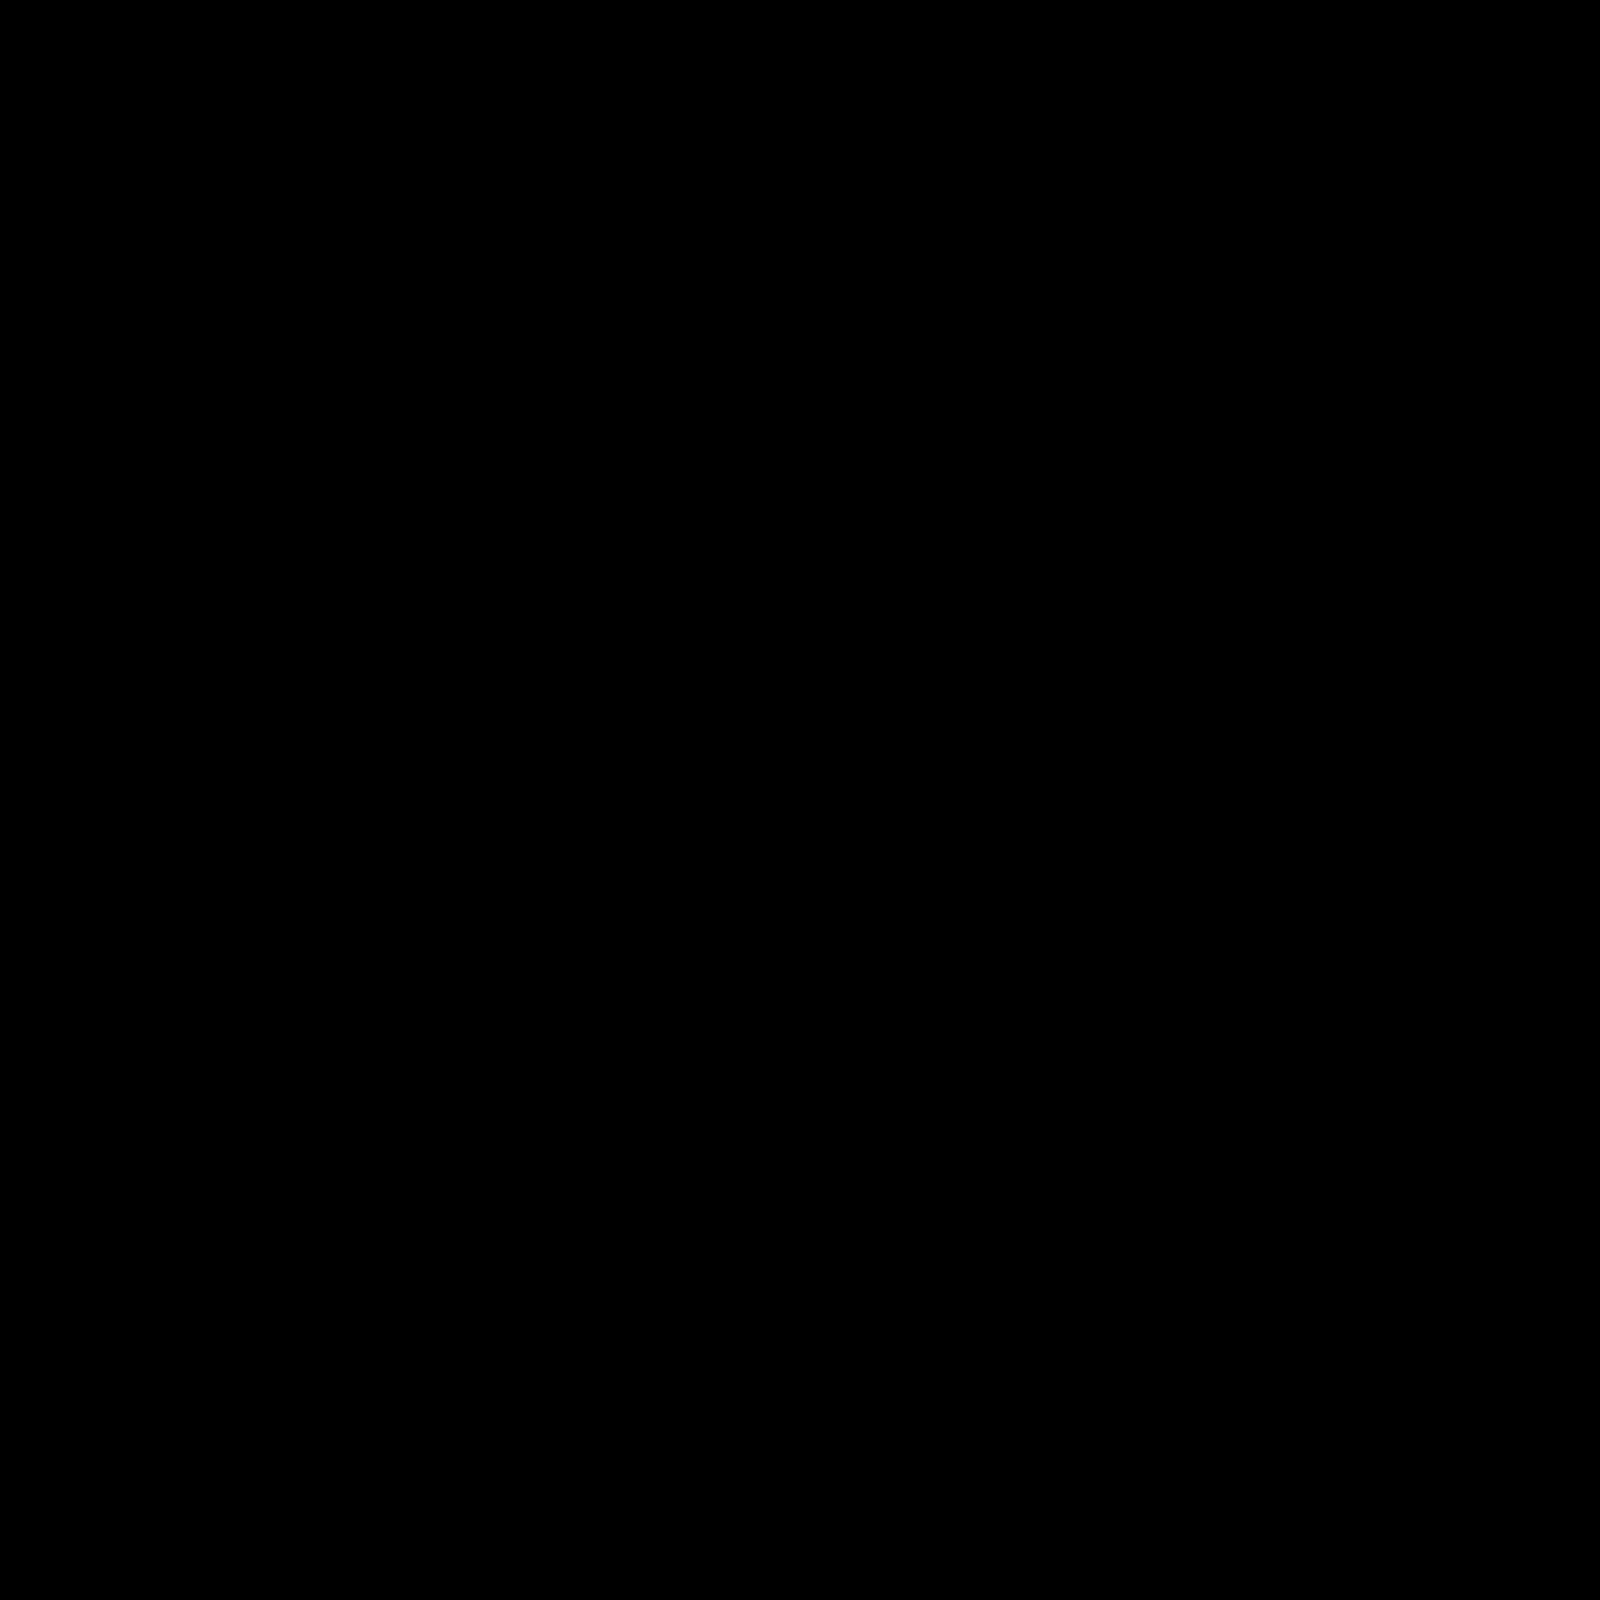 Logo Font Black & White.